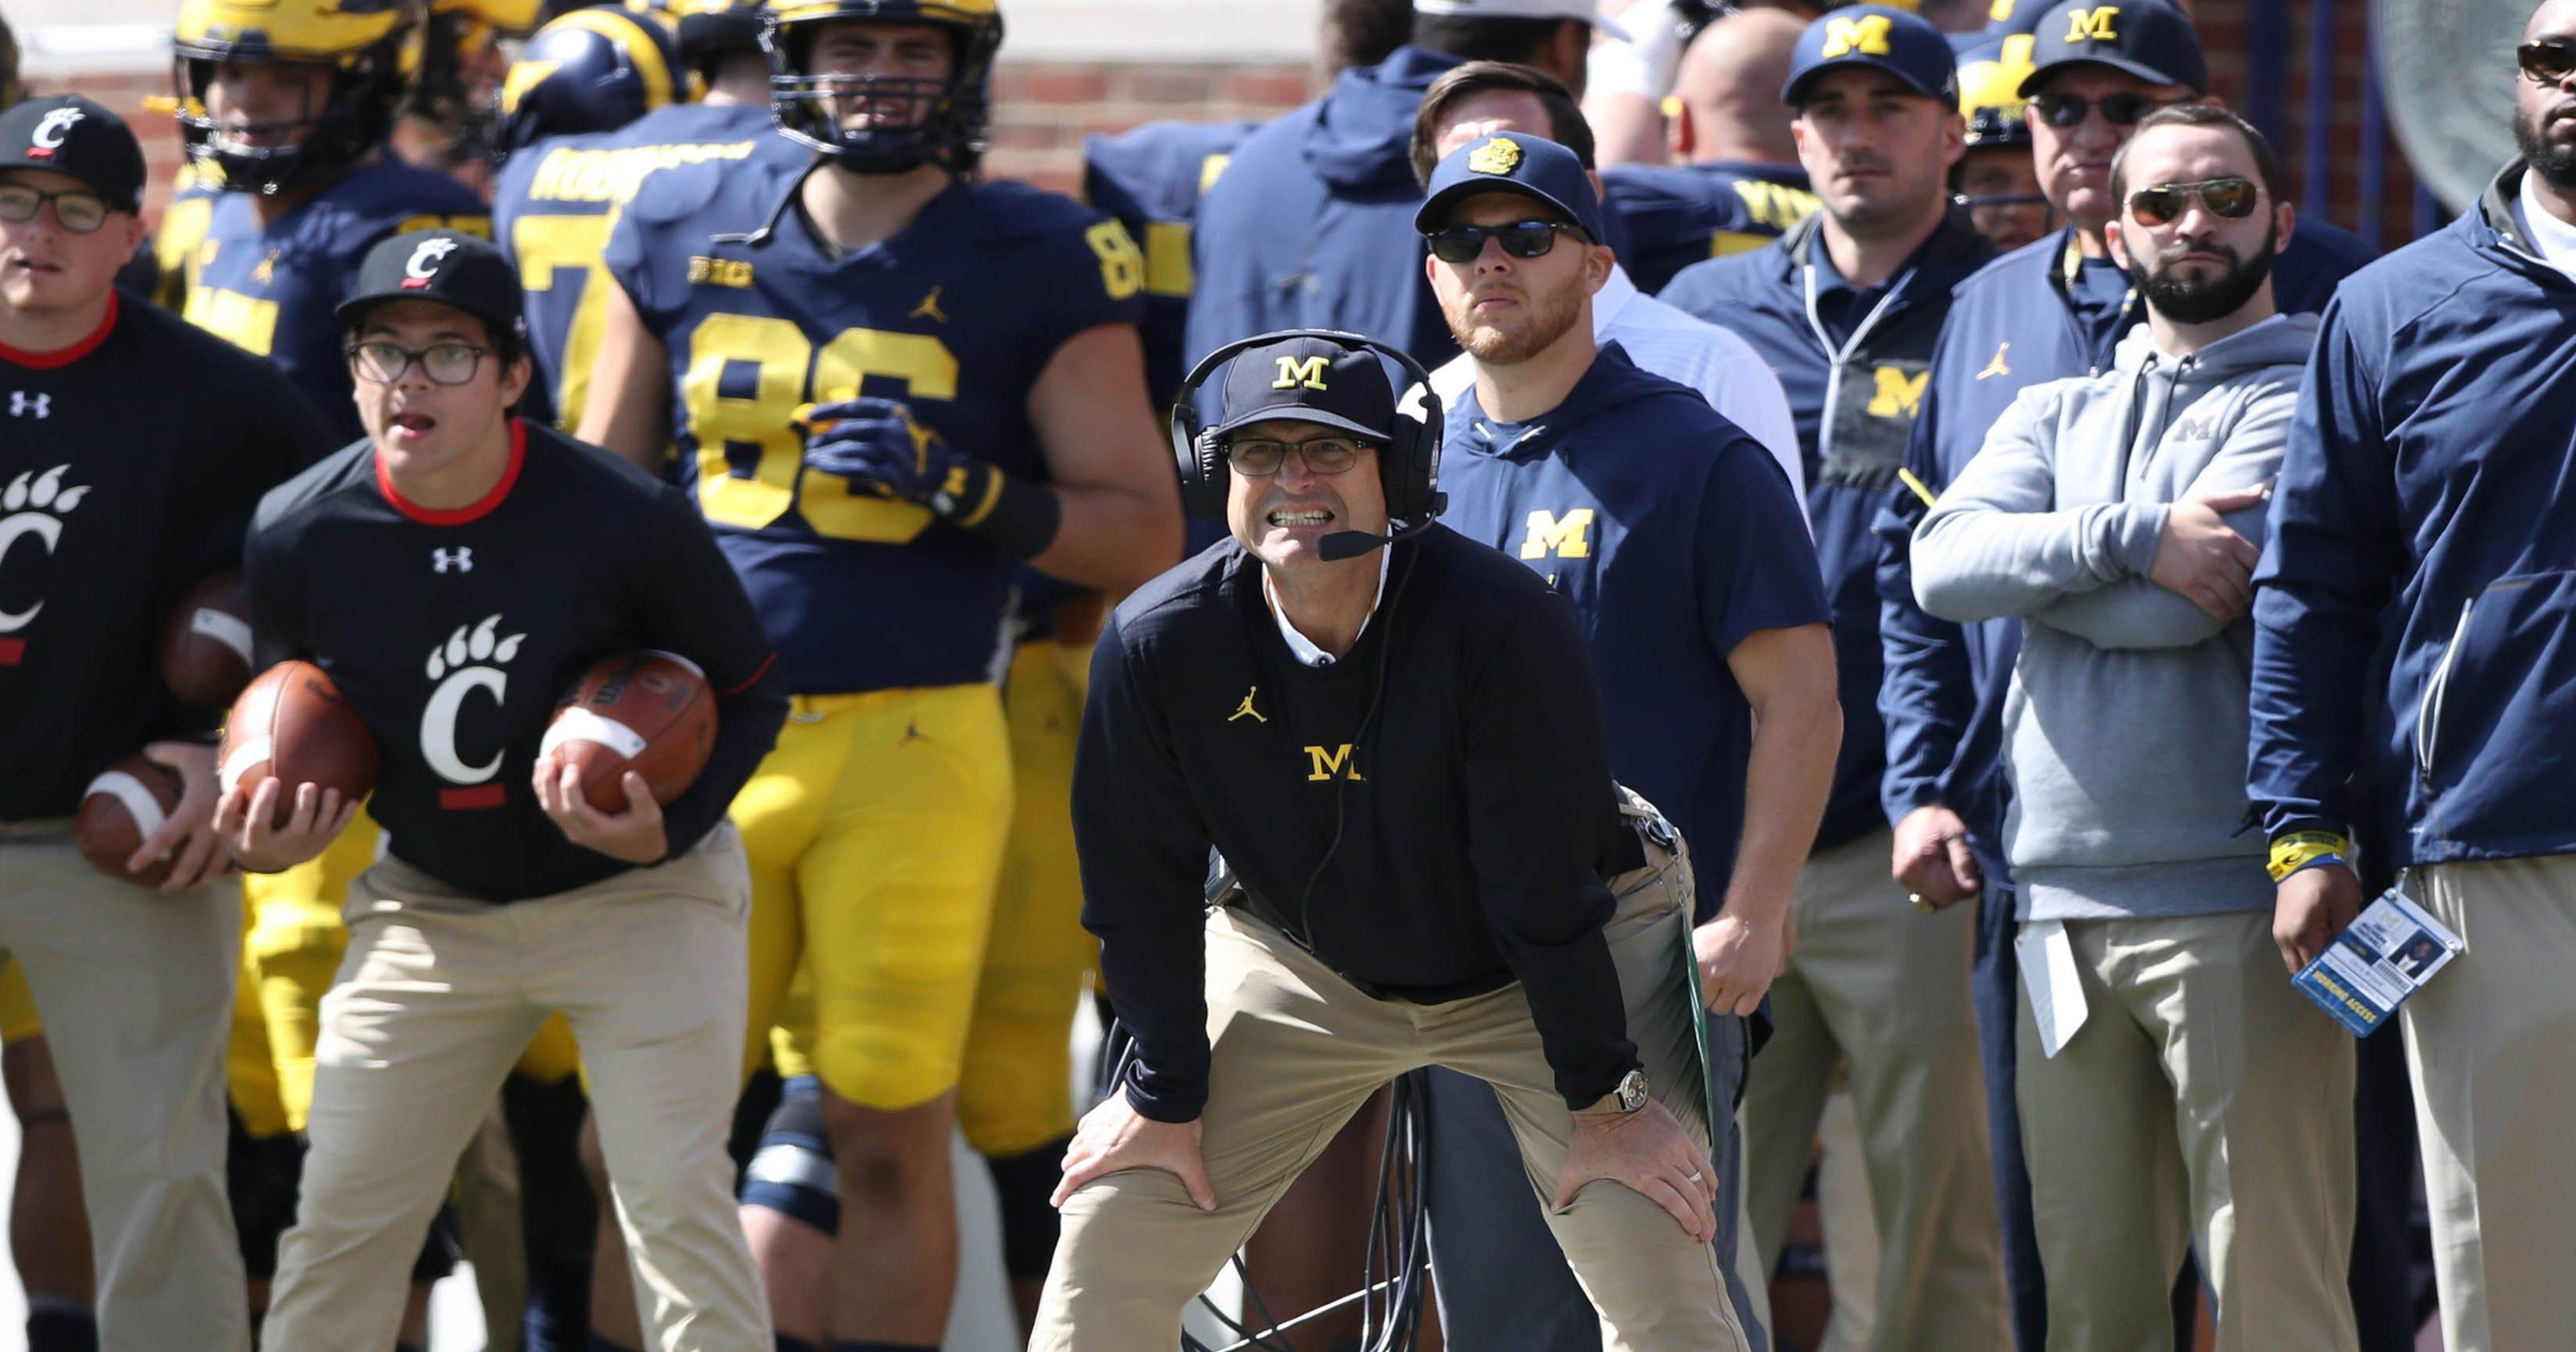 University Of Michigan Calendar 2020-2021 Michigan football unveils Big Ten schedule for 2020, 2021